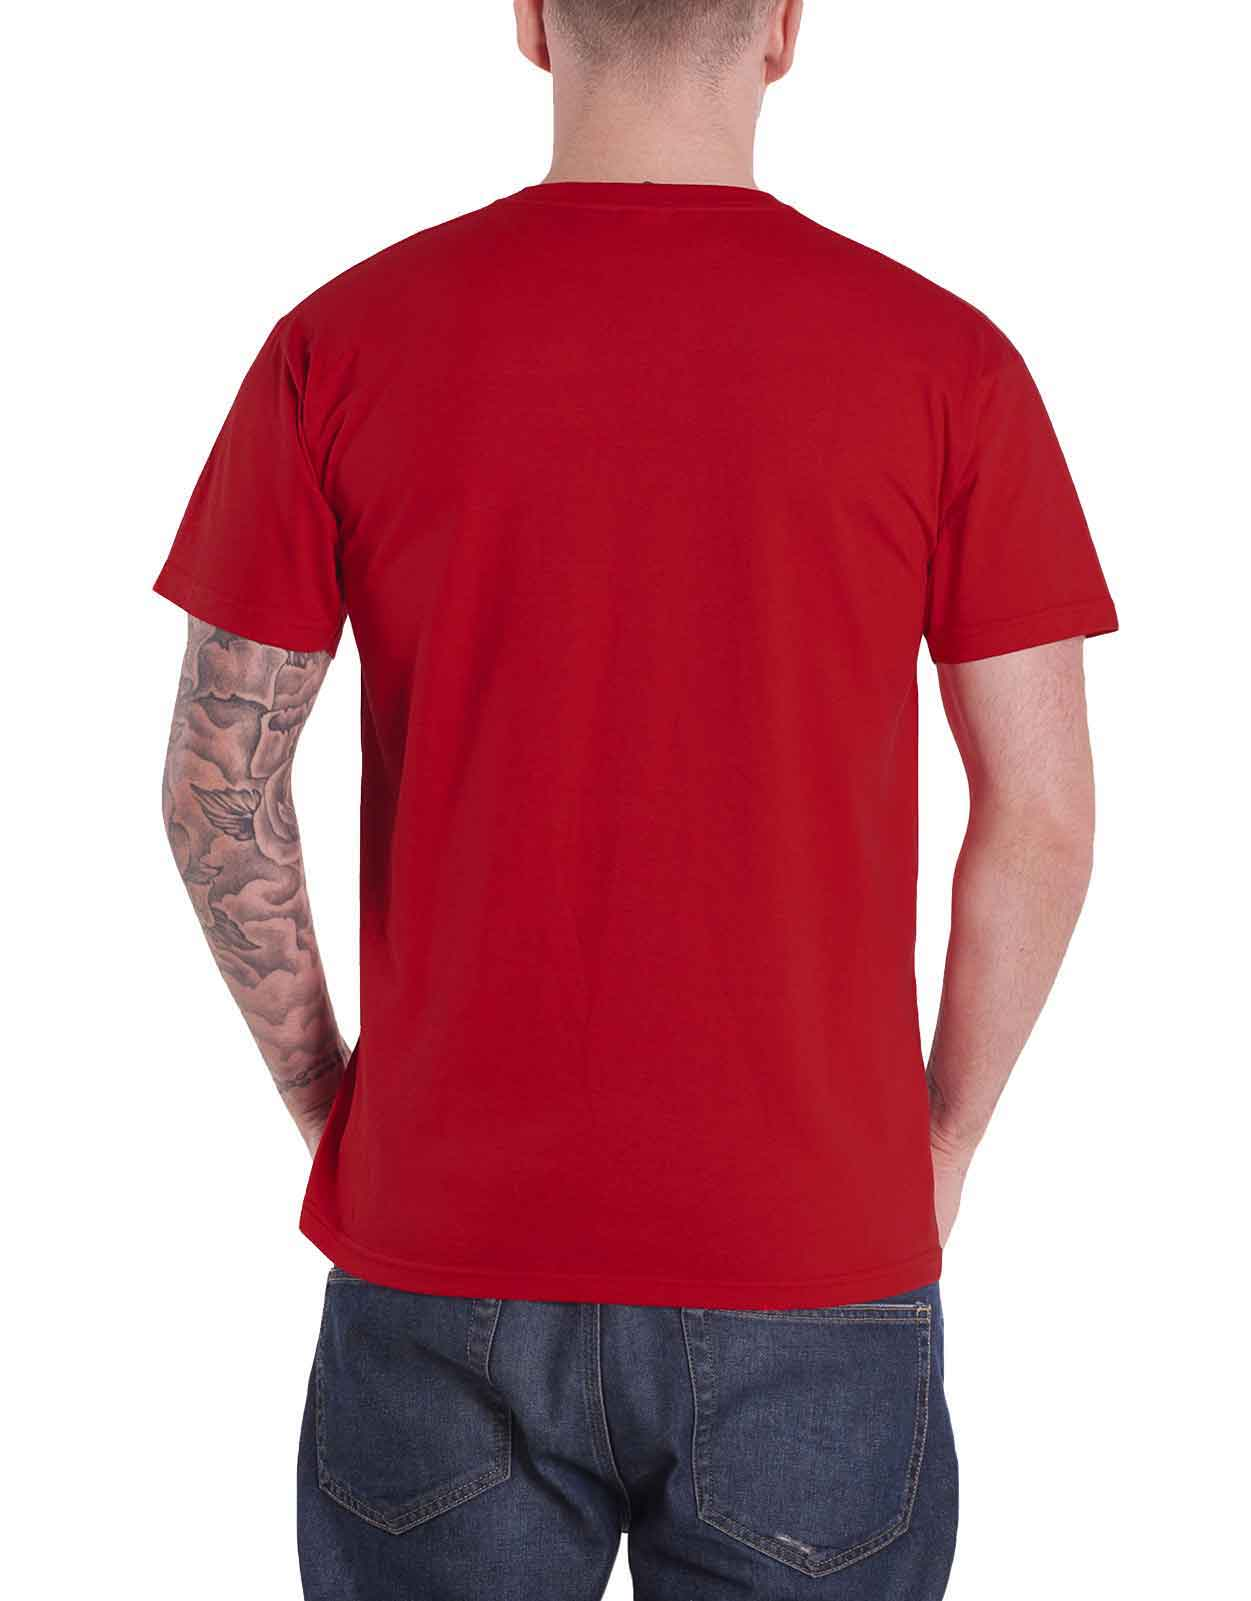 Officiel-Harry-Potter-T-Shirt-Poudlard-Gryffondor-Poufsouffle-cretes-Homme-NEUF miniature 9